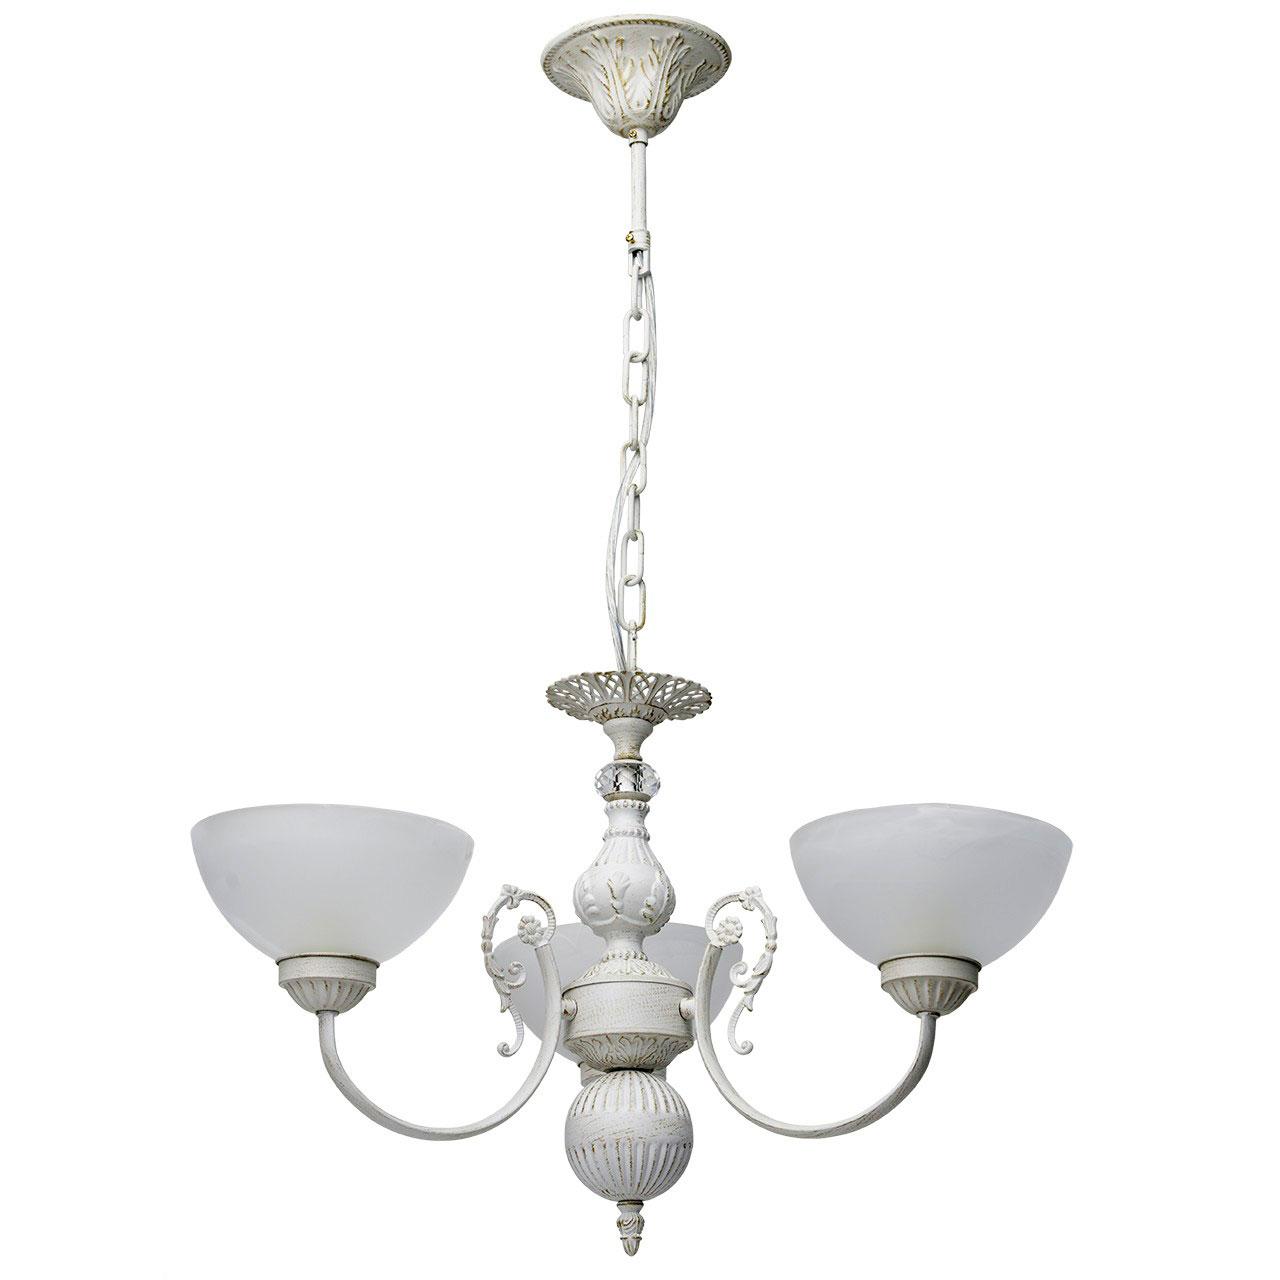 Люстра Mw lightЛюстры<br>Назначение светильника: для спальни,<br>Стиль светильника: классика,<br>Тип: подвесная,<br>Материал светильника: металл, стекло, хрусталь,<br>Материал плафона: стекло, хрусталь,<br>Материал арматуры: металл,<br>Длина (мм): 380,<br>Ширина: 240,<br>Высота: 800,<br>Количество ламп: 3,<br>Тип лампы: накаливания,<br>Мощность: 60,<br>Патрон: Е14,<br>Цвет арматуры: бежевый,<br>Коллекция: Олимп<br>